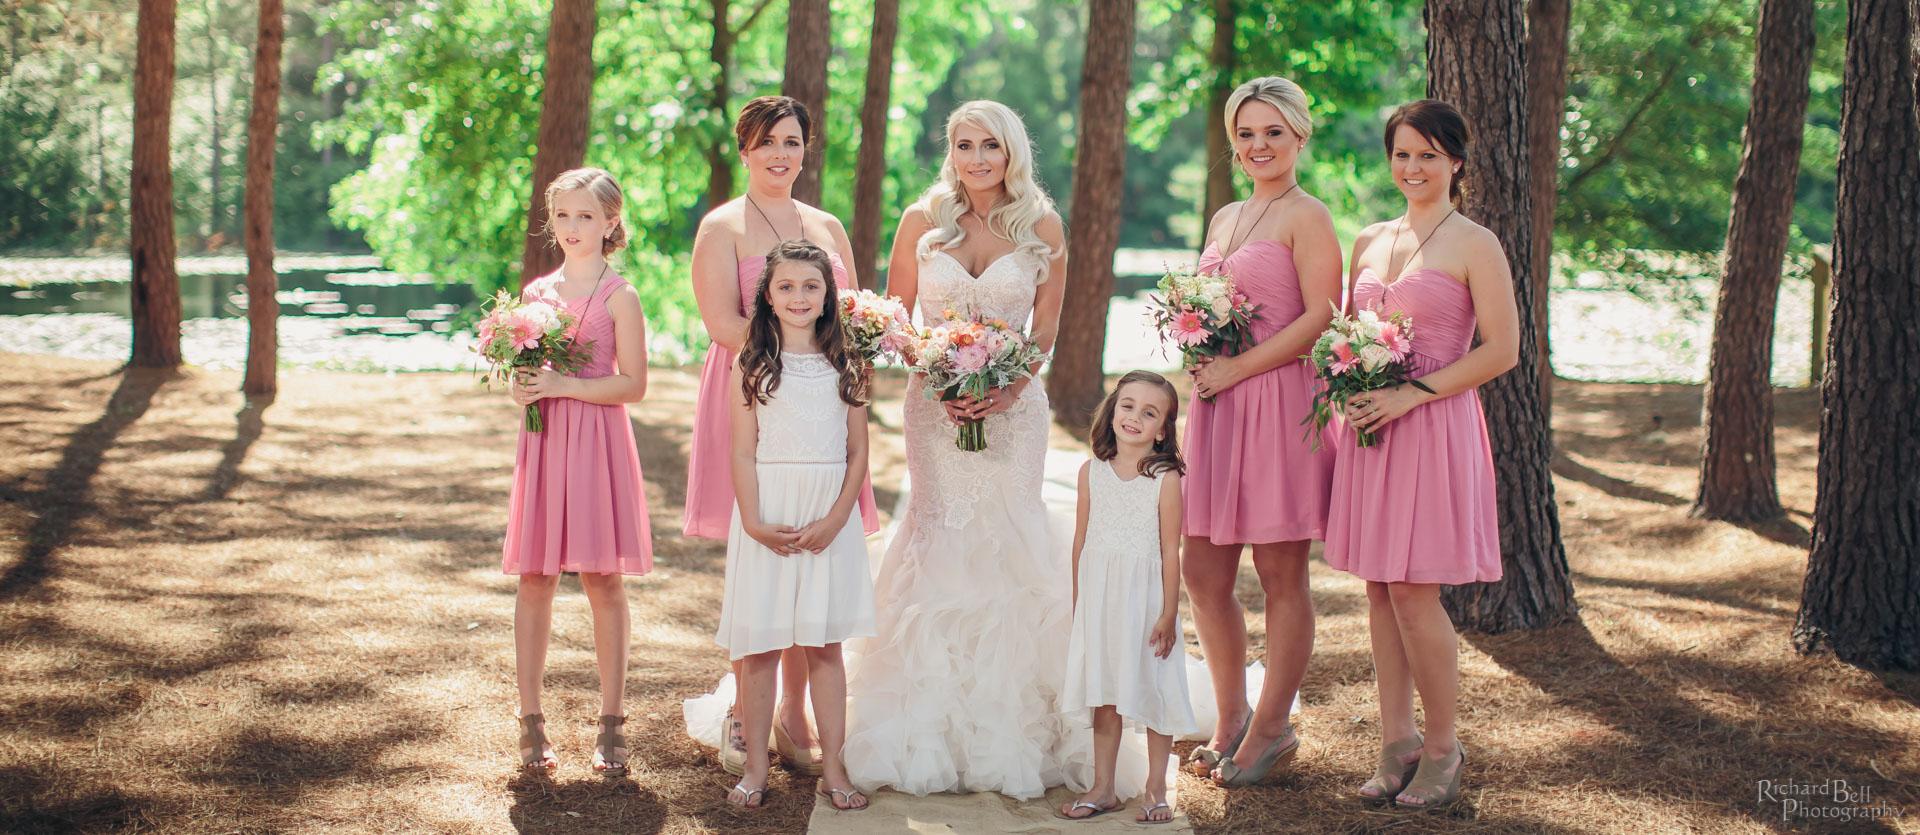 Olivia and Bridemaids